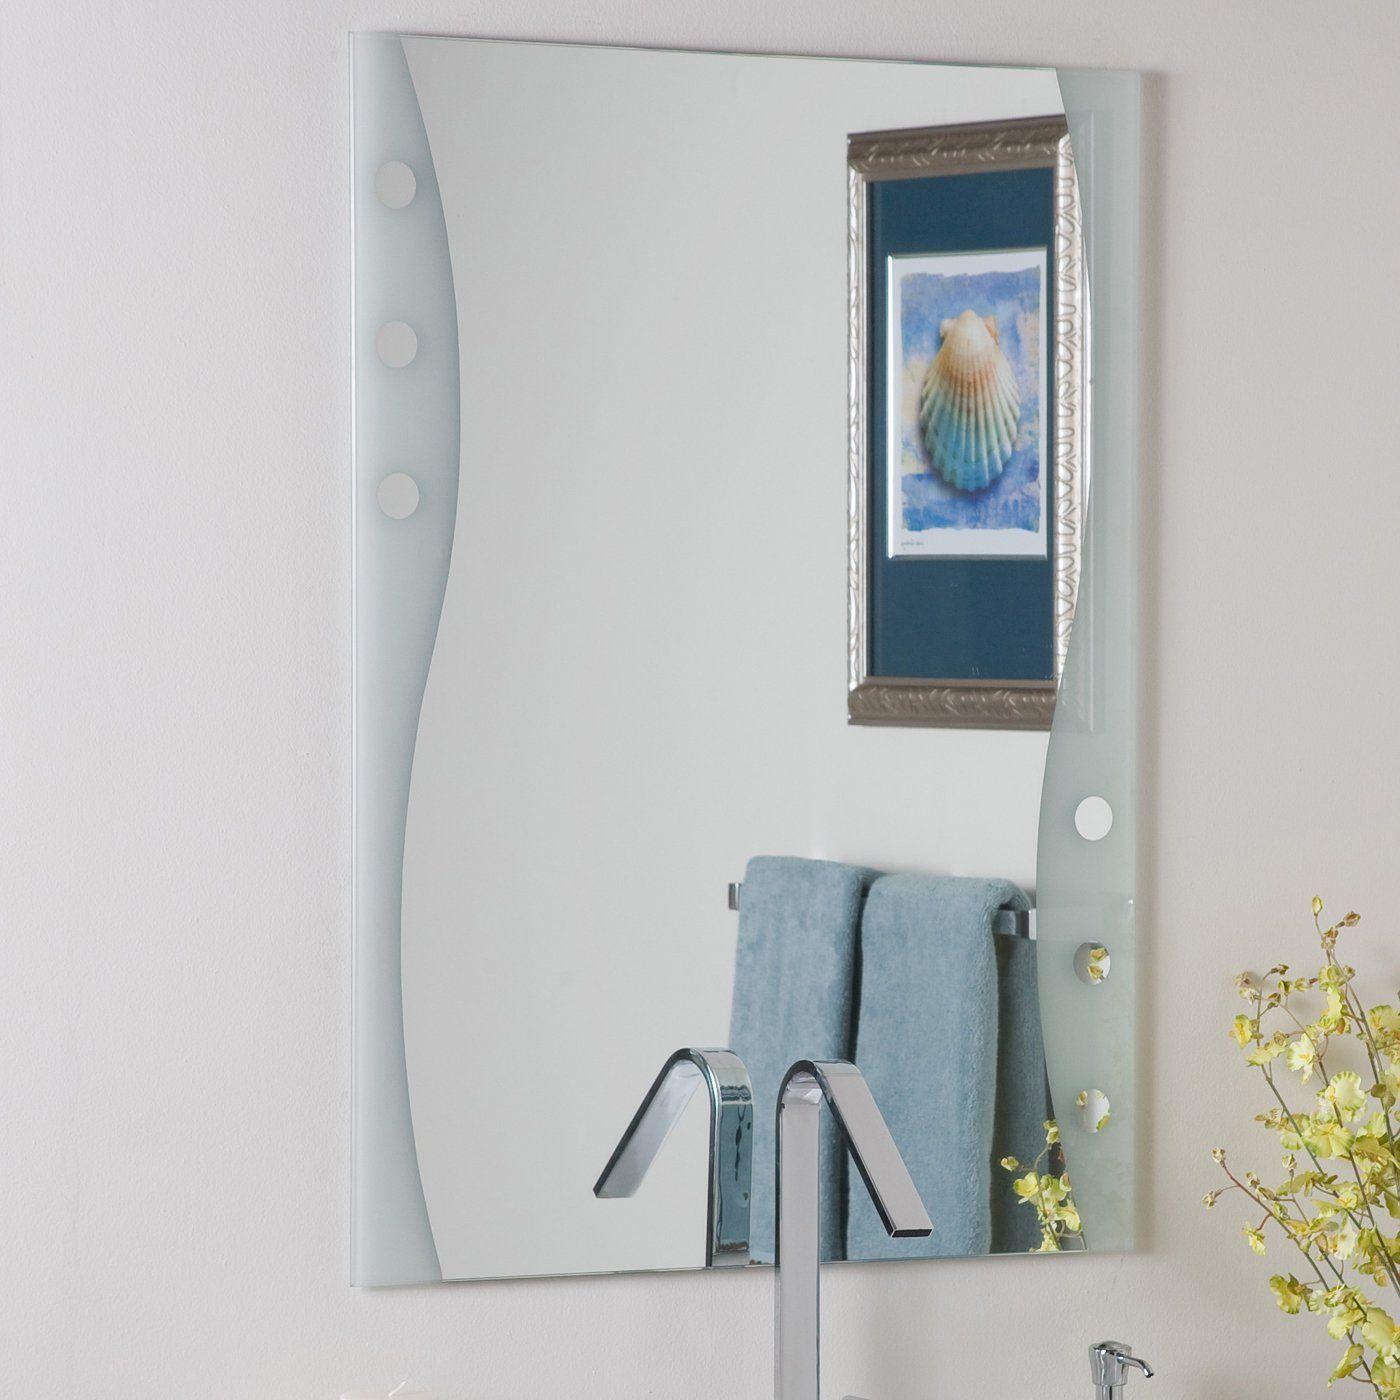 Decor Wonderland SSM182 Frameless Bathroom Mirror | amazing ...